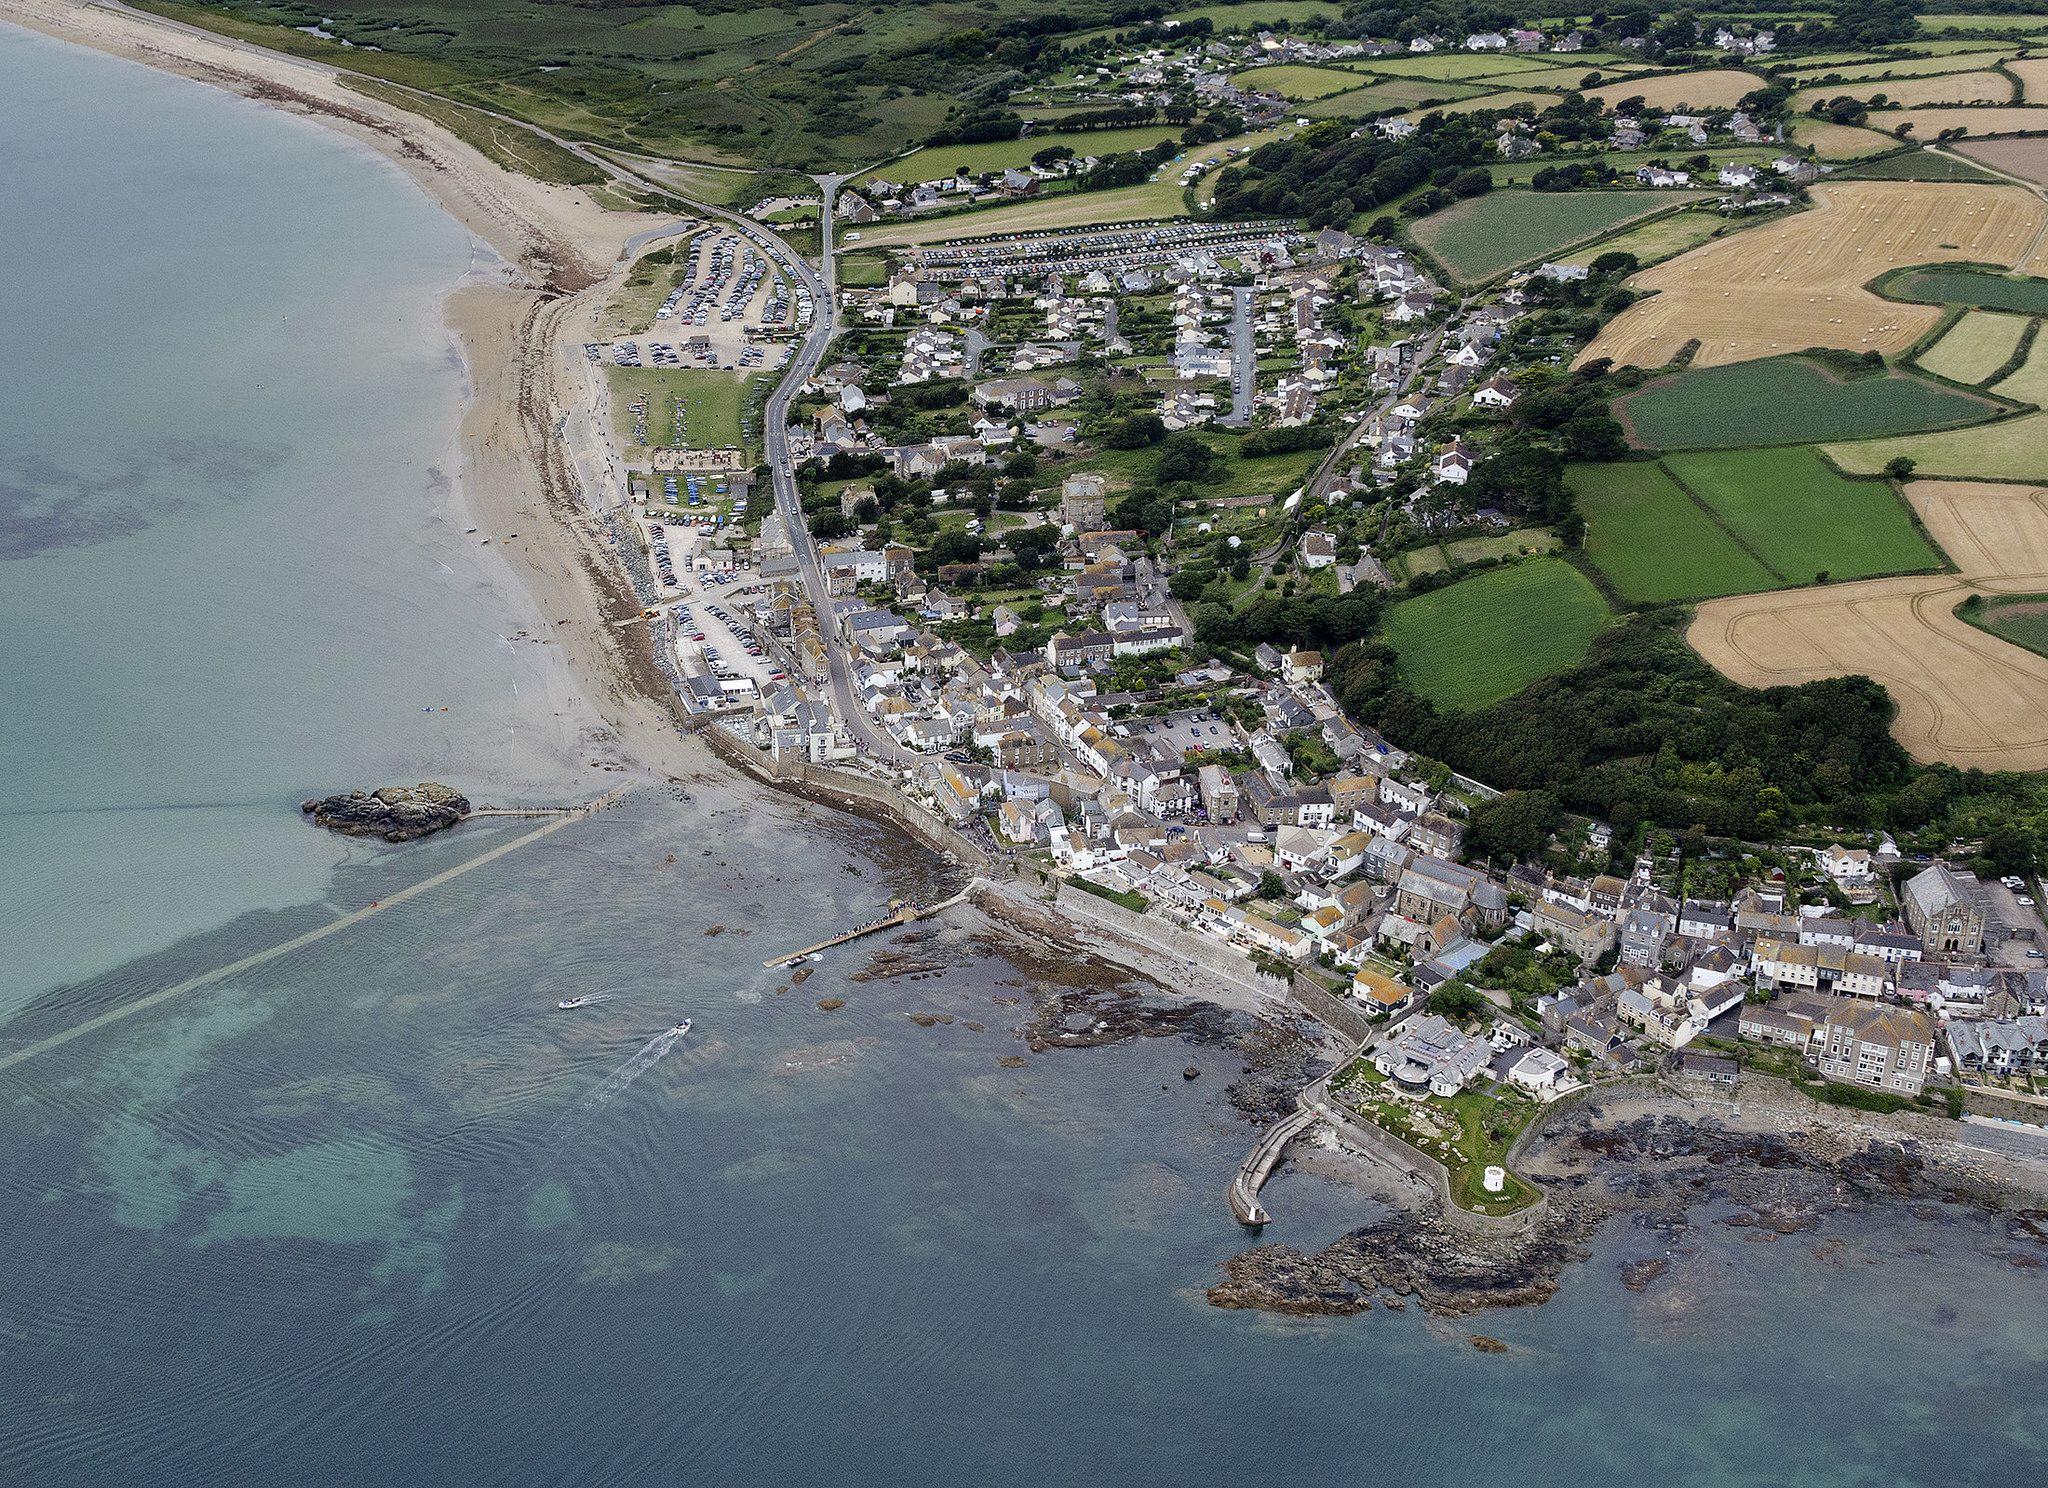 Marazion in Cornwall UK aerial image | by John Fielding #stmichaelsmount #castle #abbey #cornwall #coast #aerial #marazion